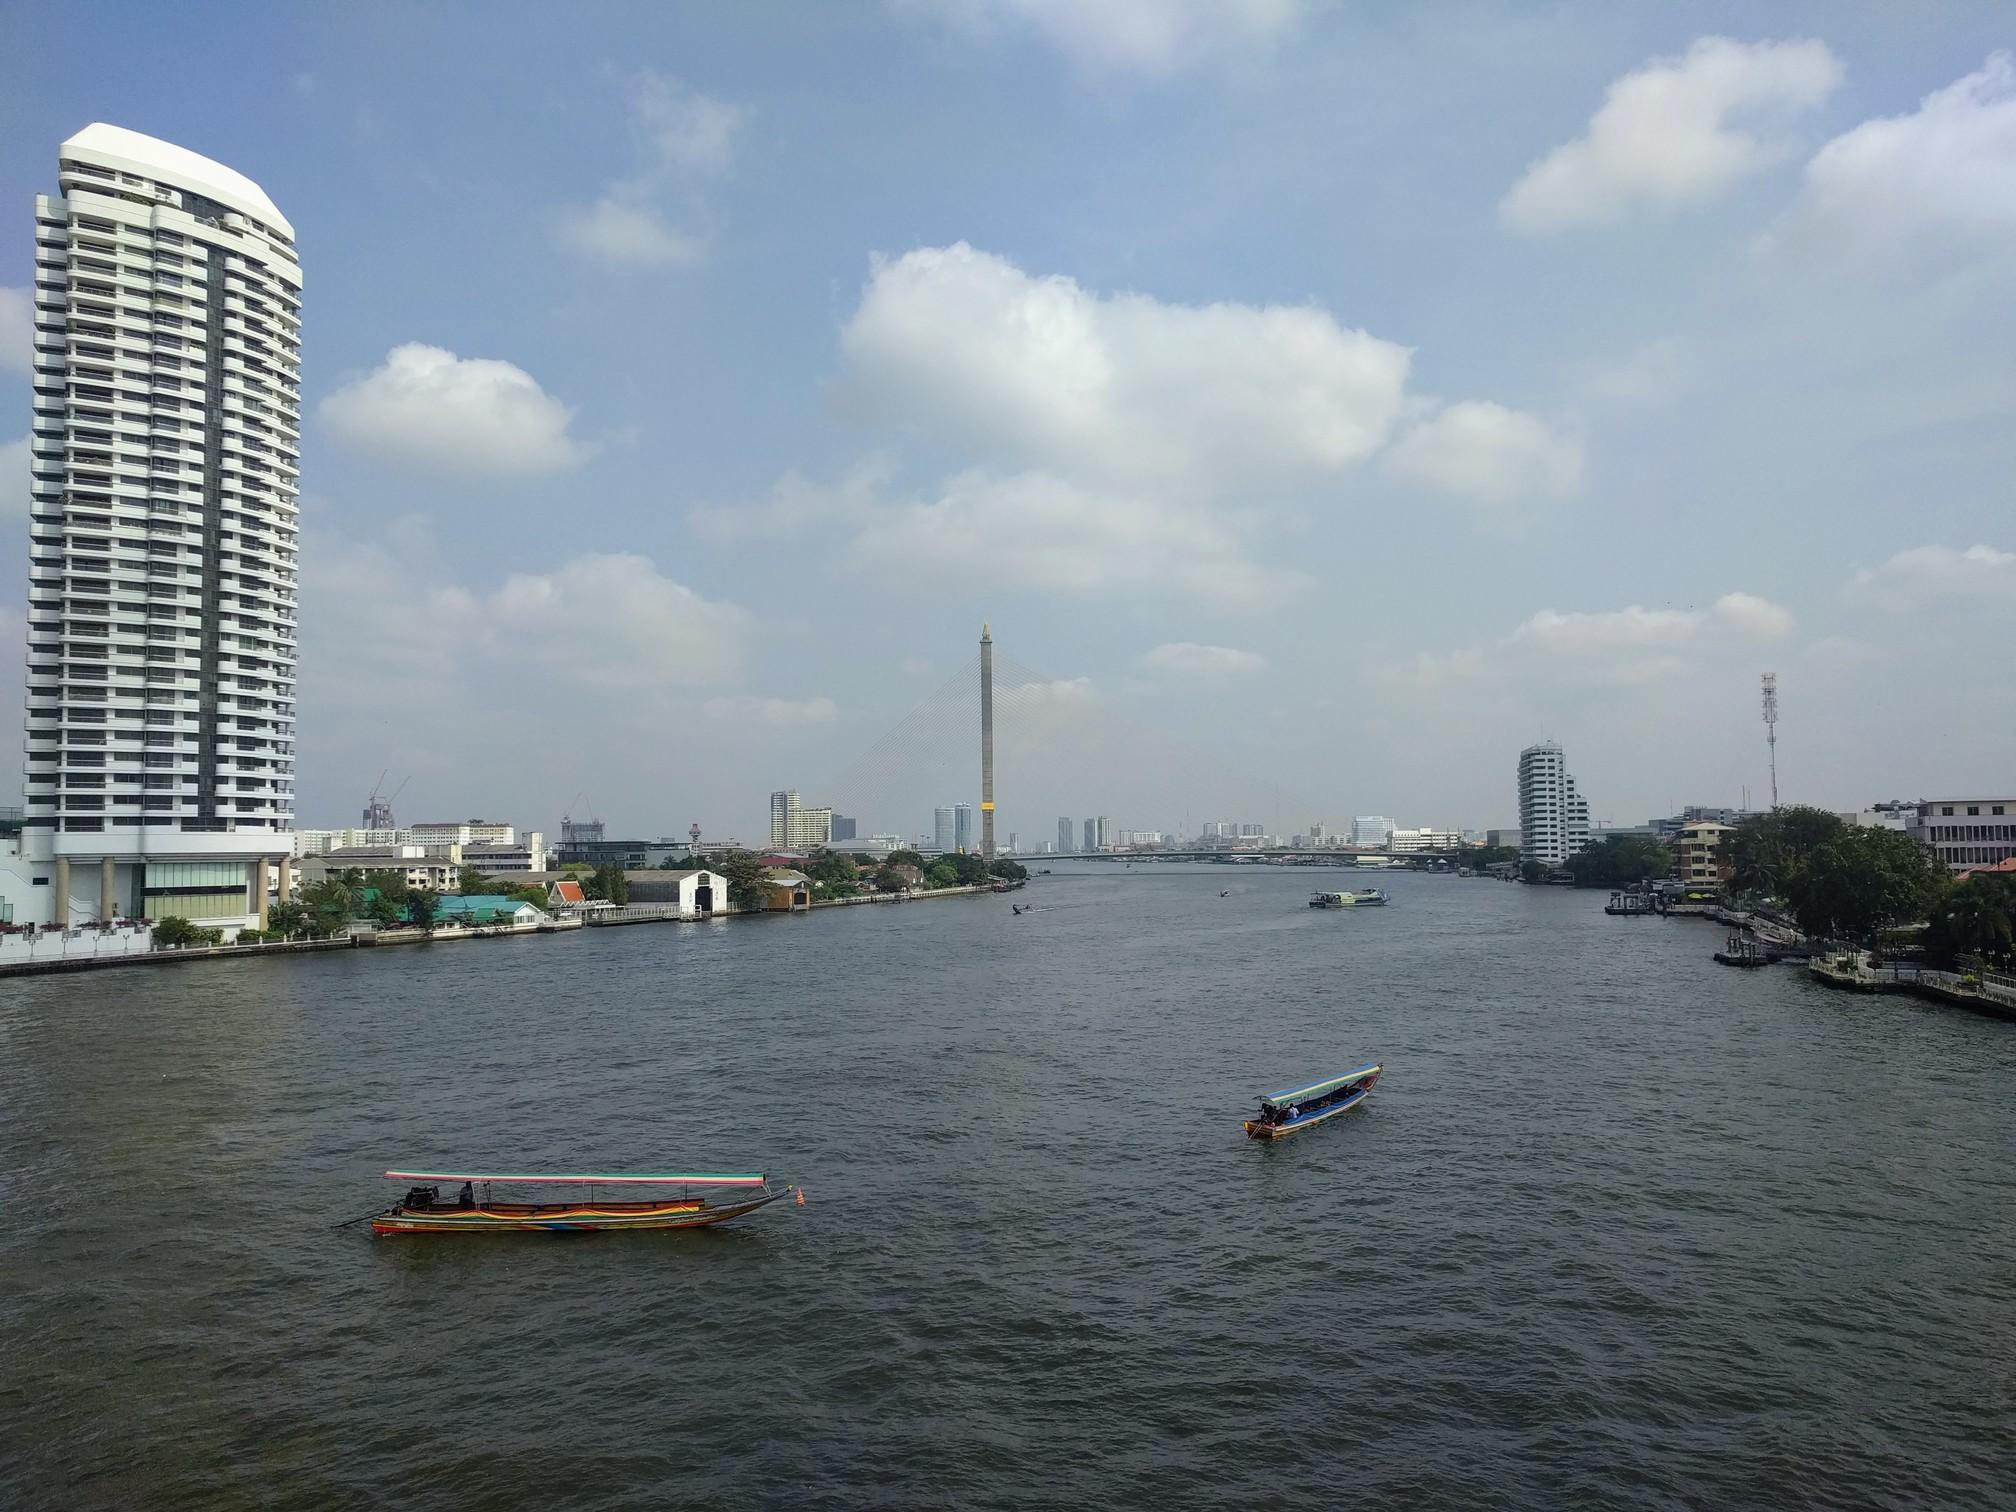 /images/view_from_Phra_Pin_Klao_Bridge.jpg